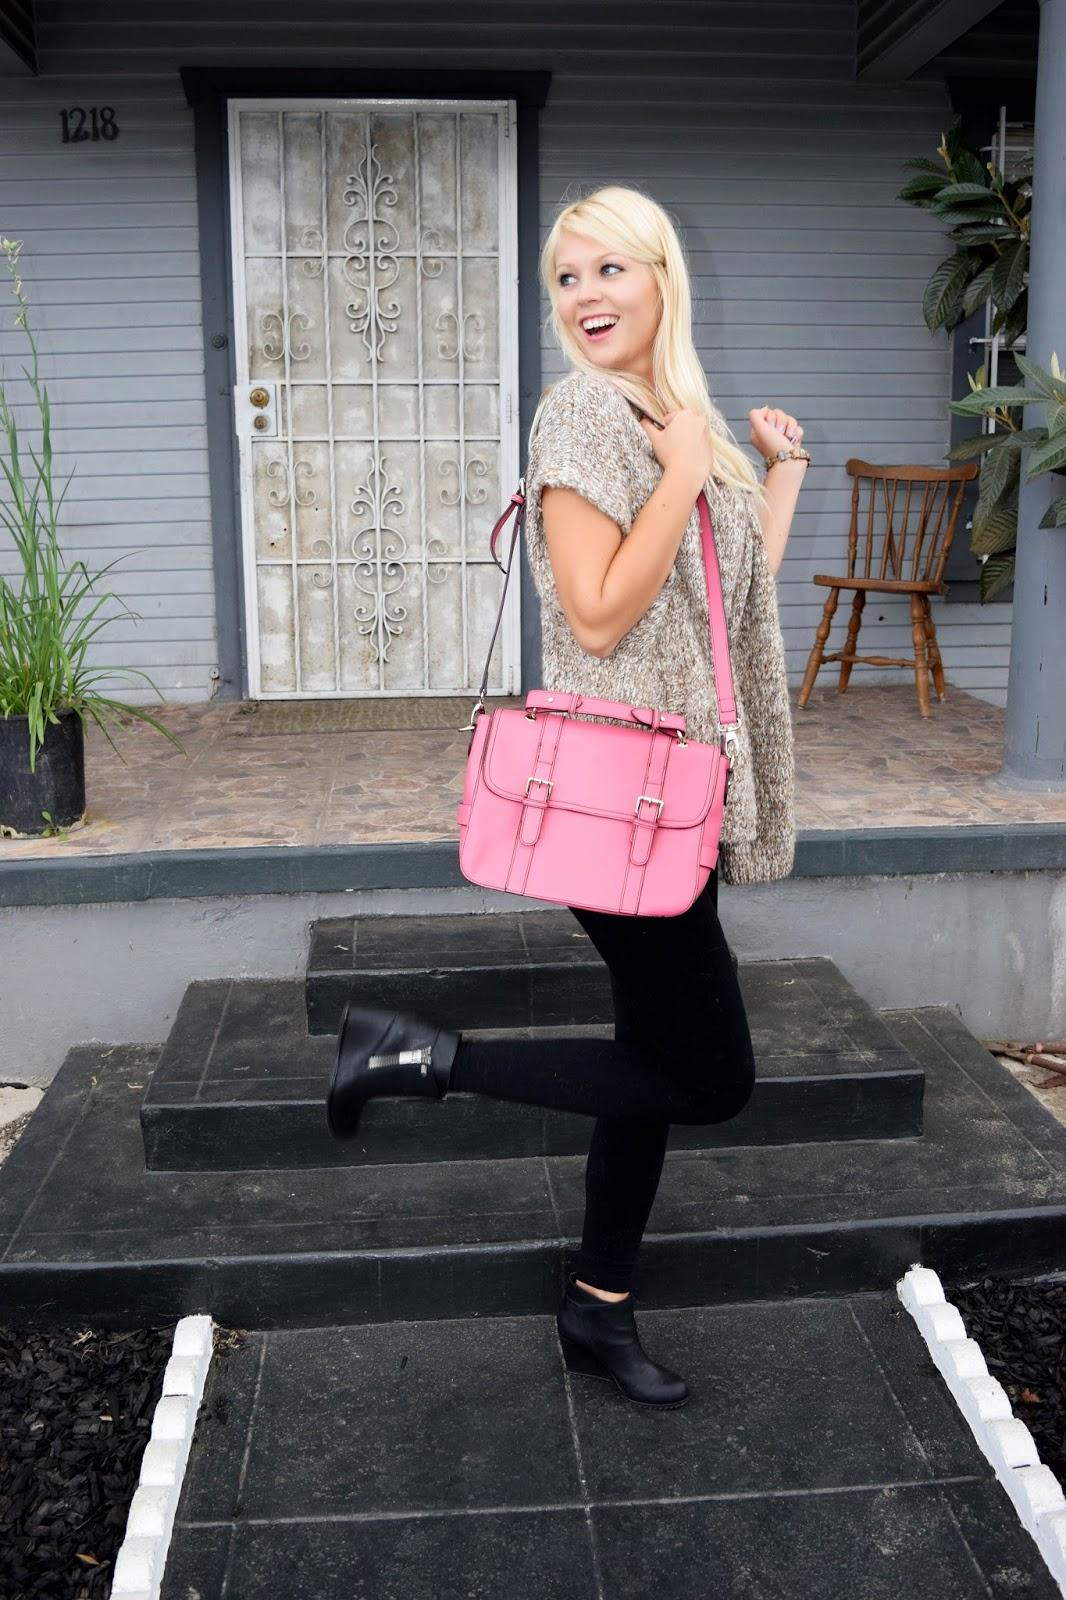 Pink, Purse, Ifchic, ifchic24, cross bag